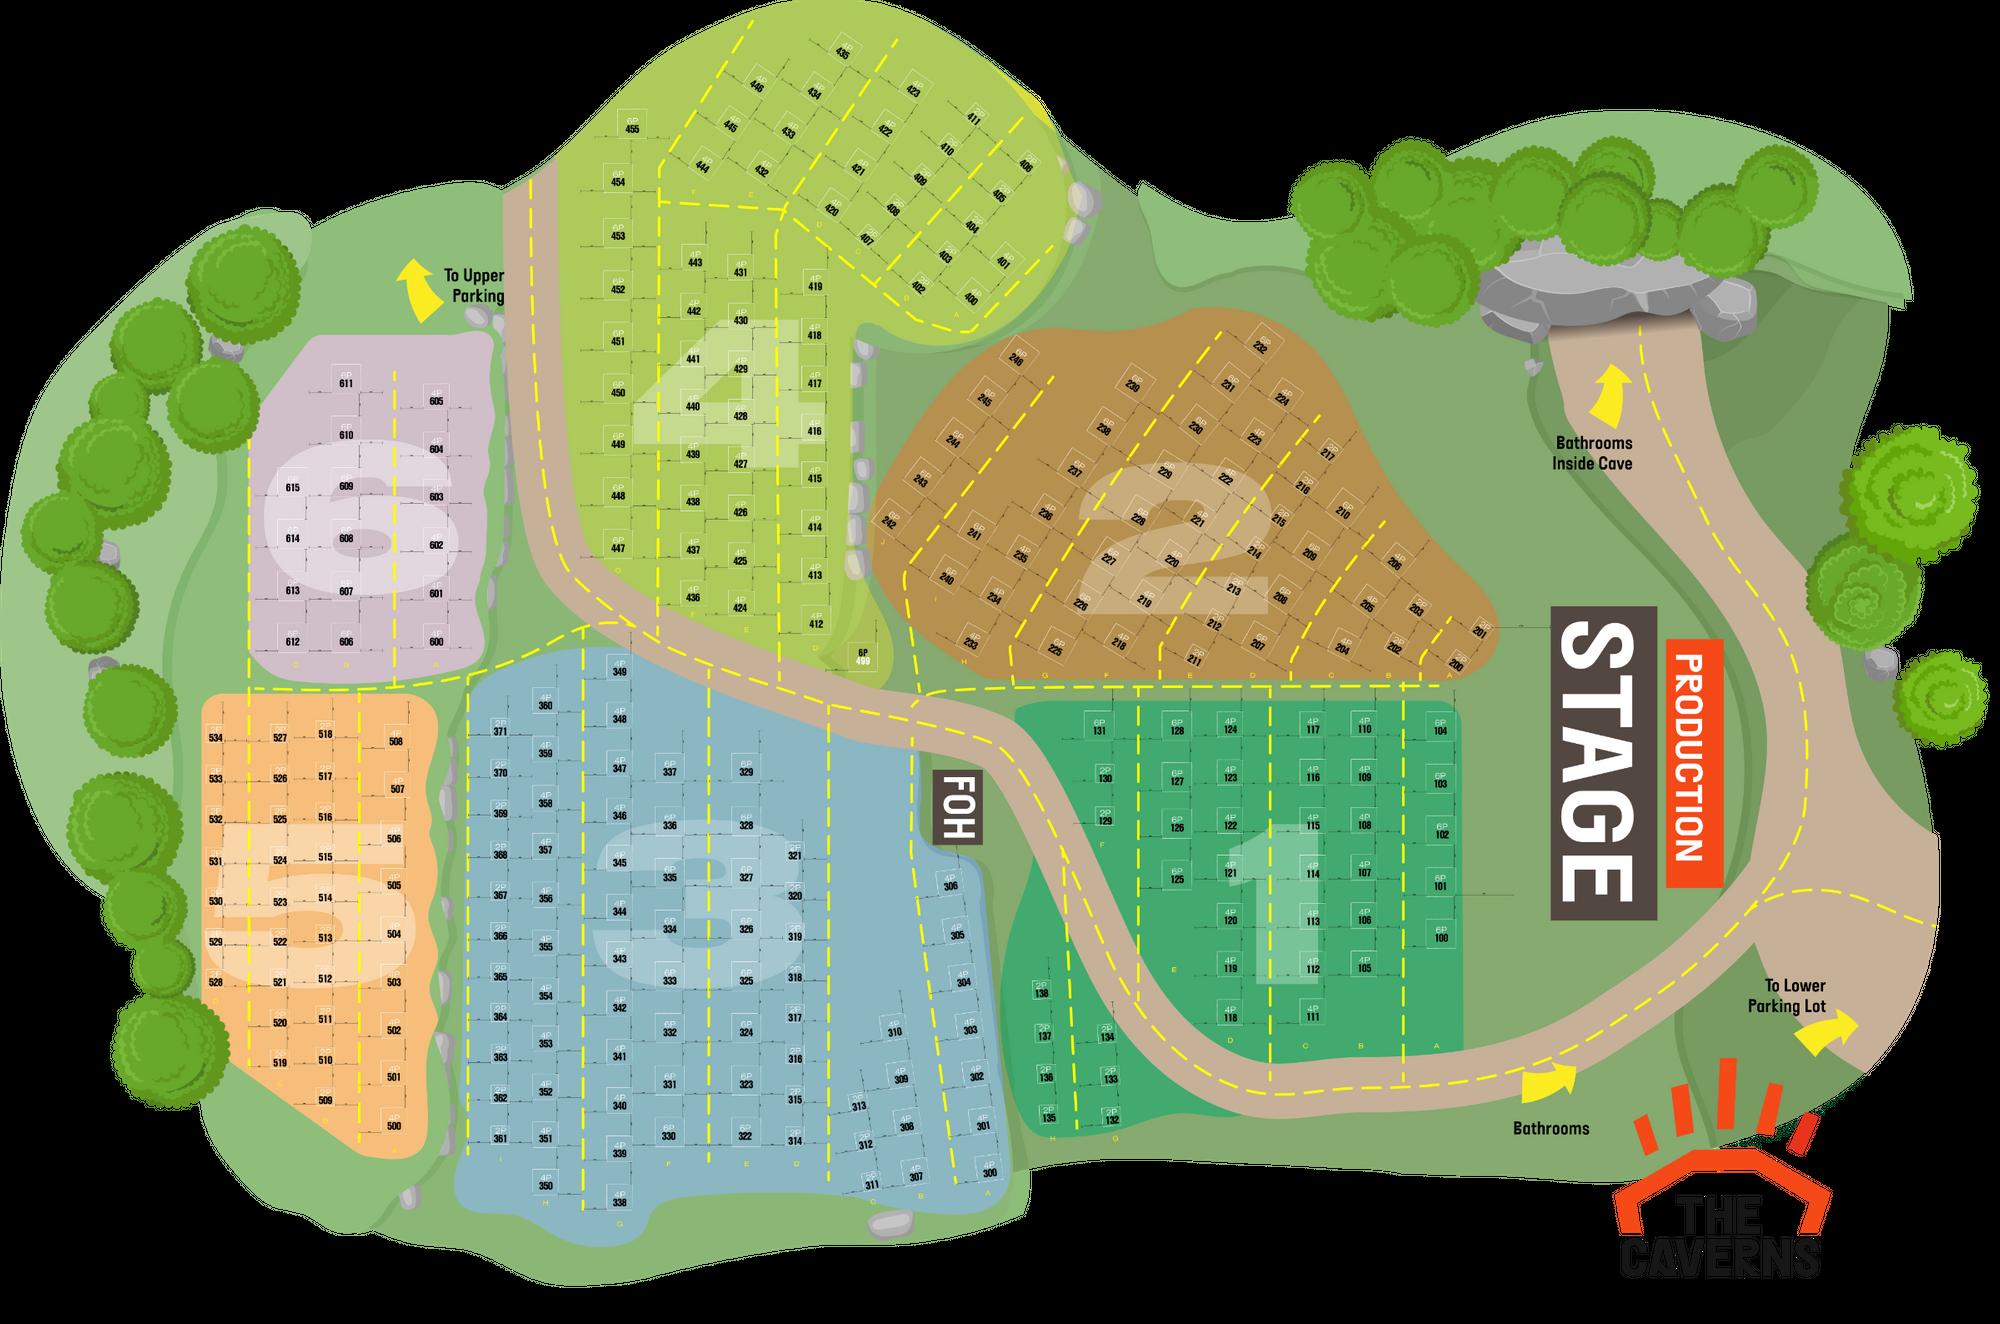 The Caverns Amp Venue Map.png